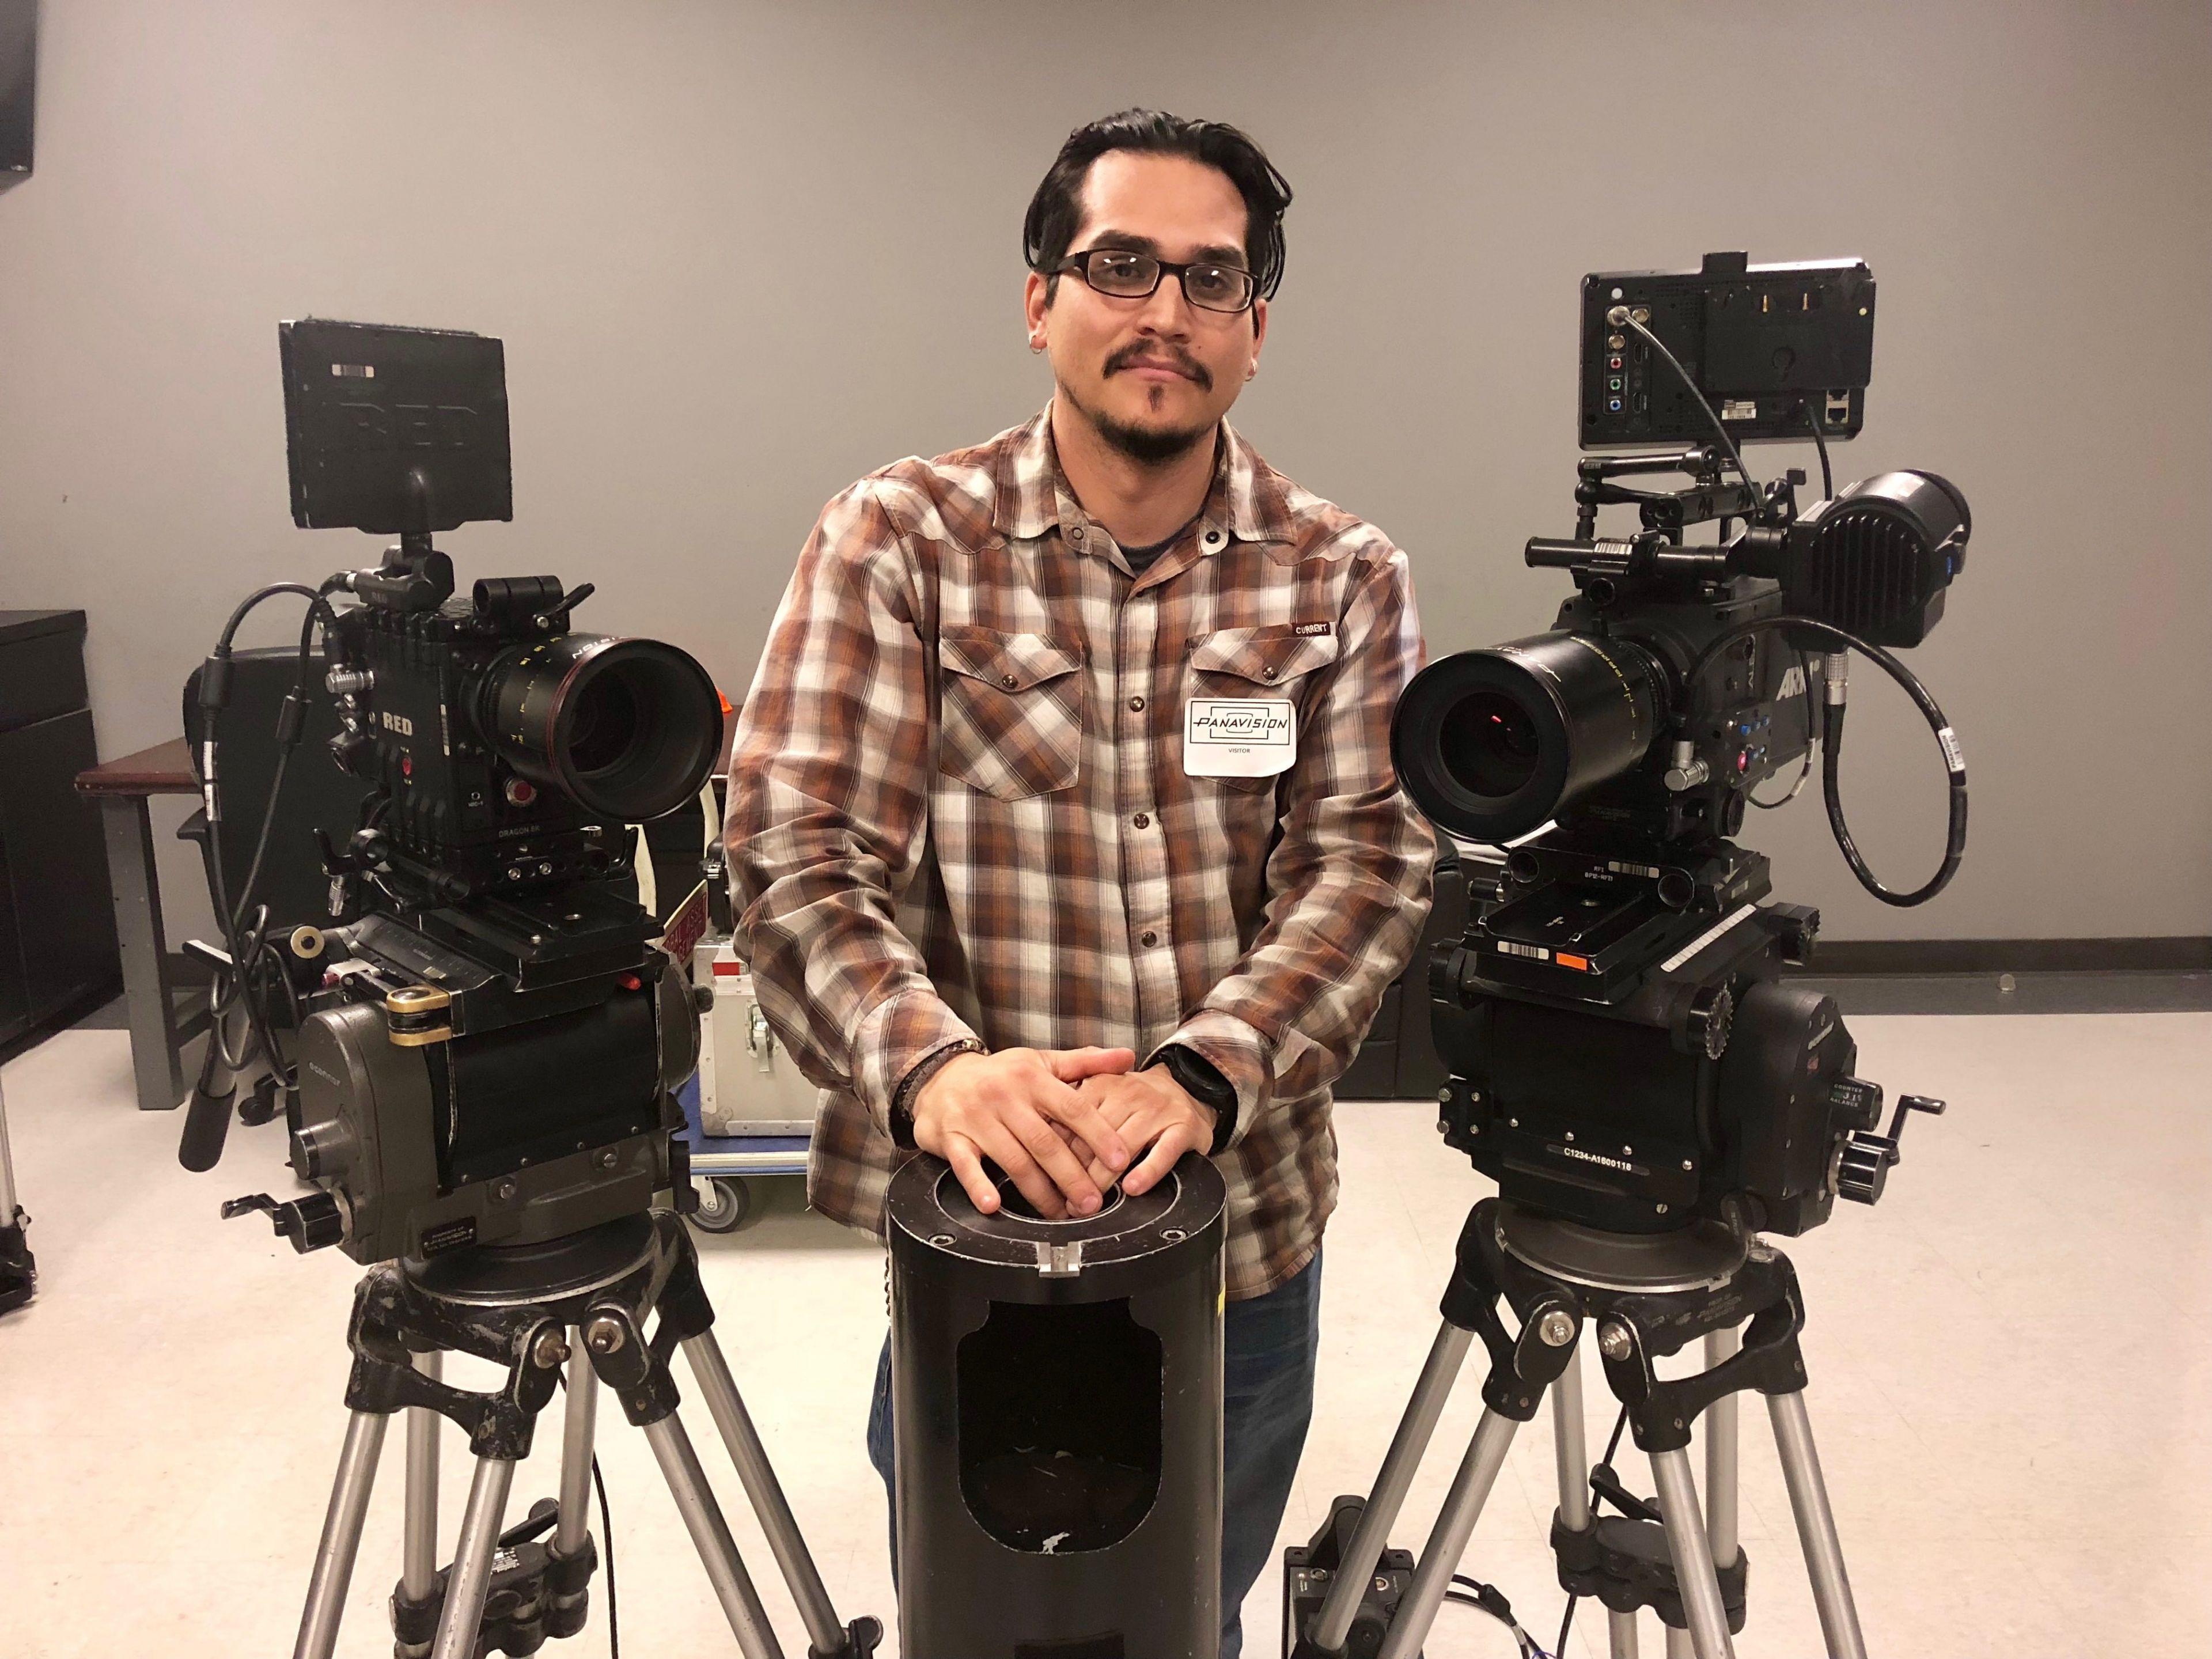 Filmmaker Friday featuring Filmmaker Miguel Angel Duran 2